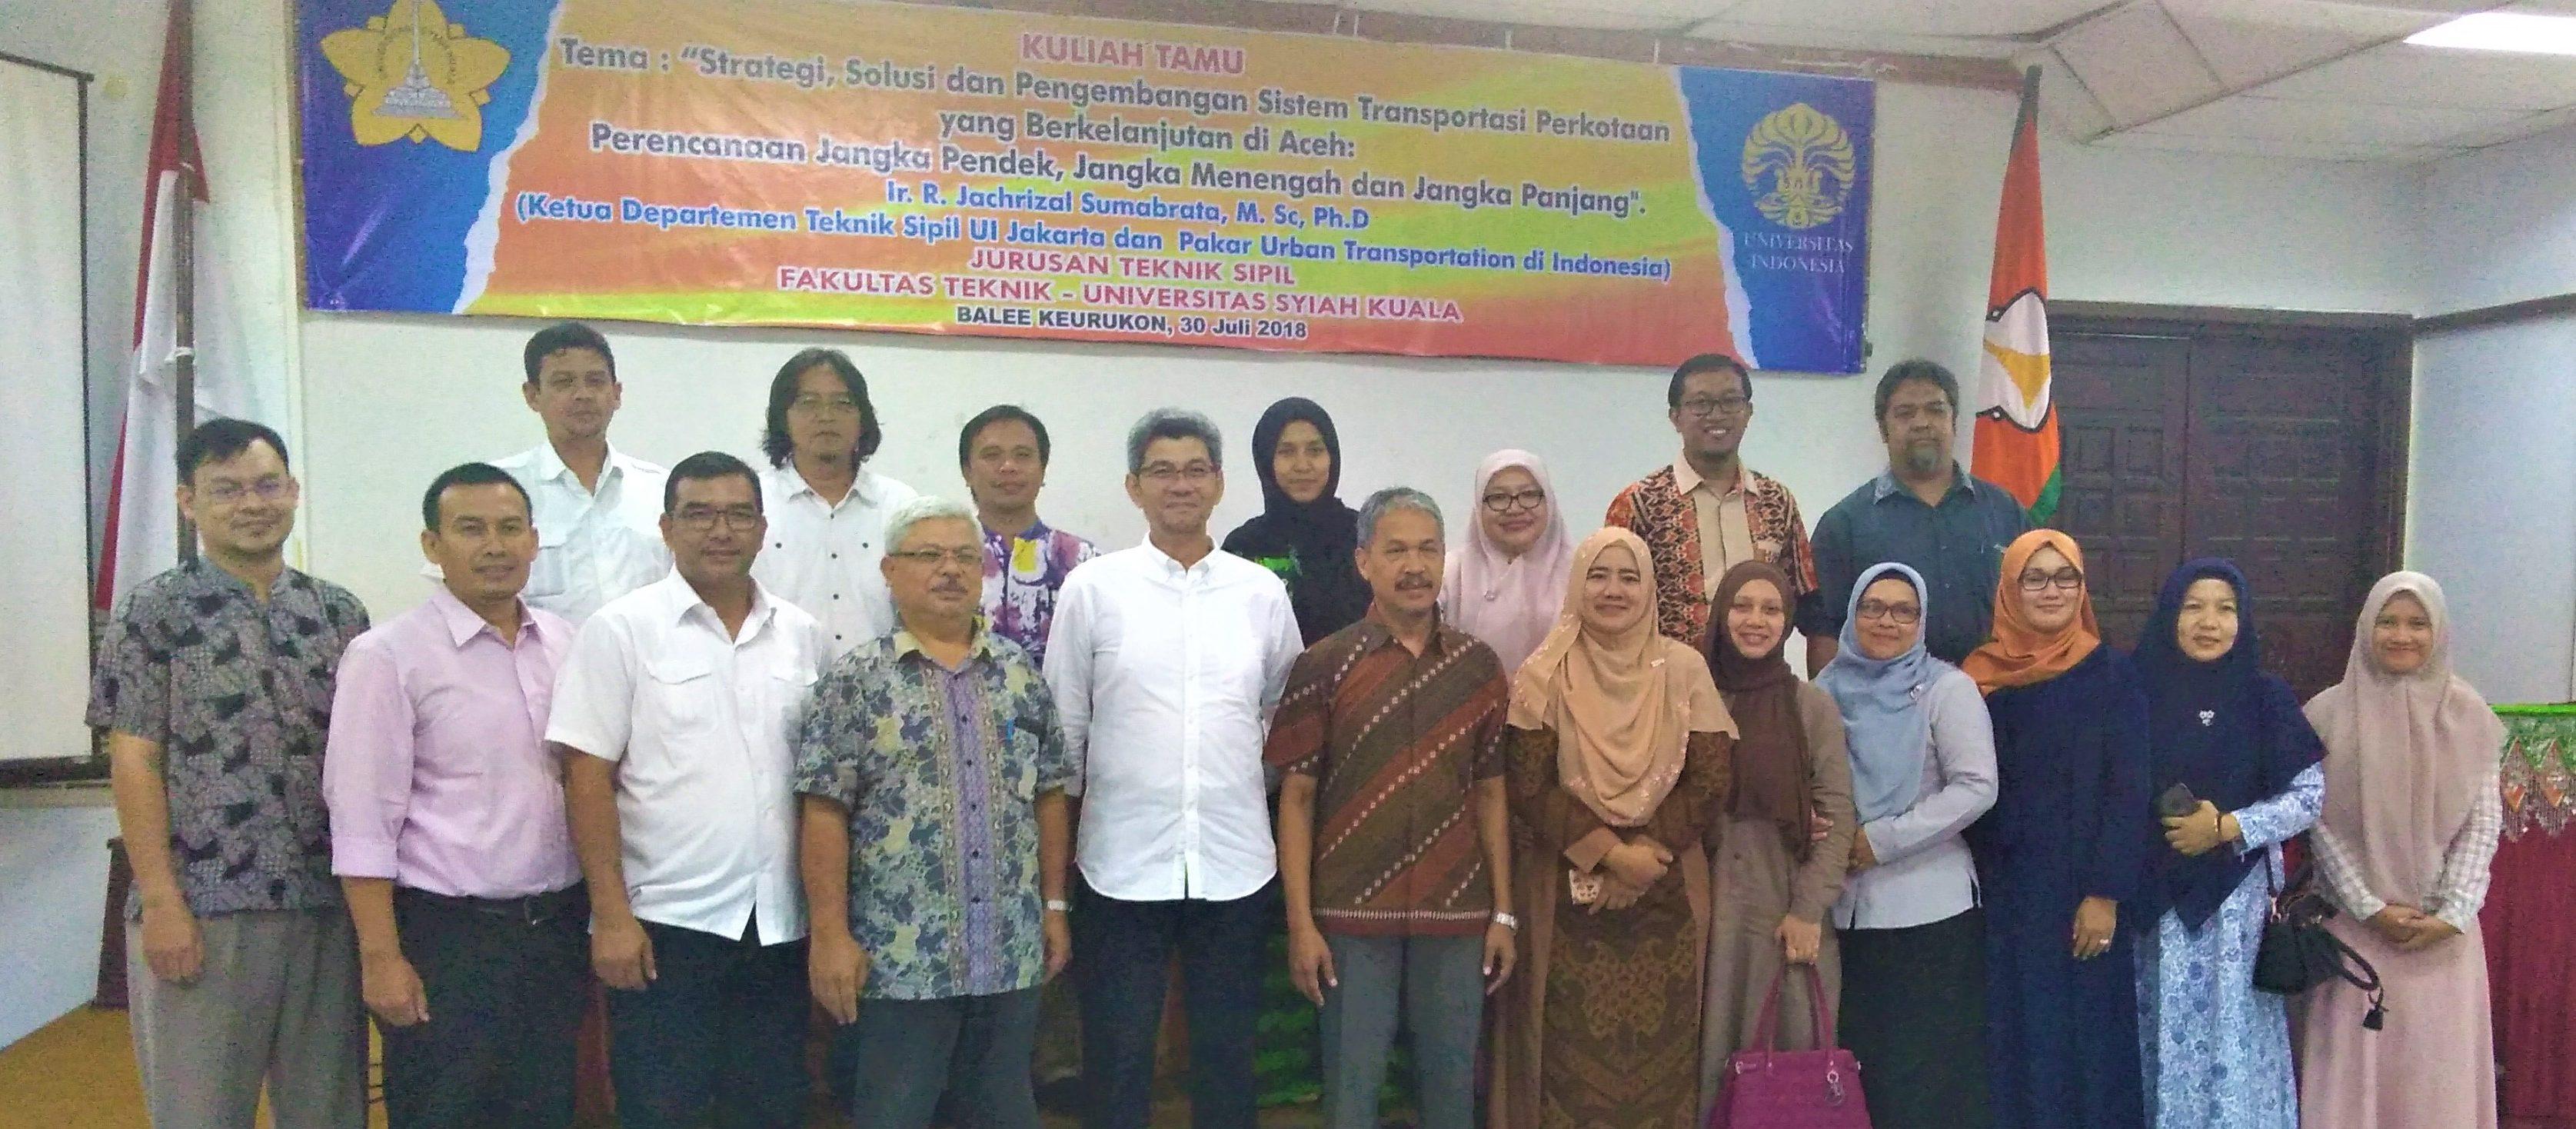 Kuliah Tamu Bersama Pakar Urban Transportation Indonesia 30 Juli 2018